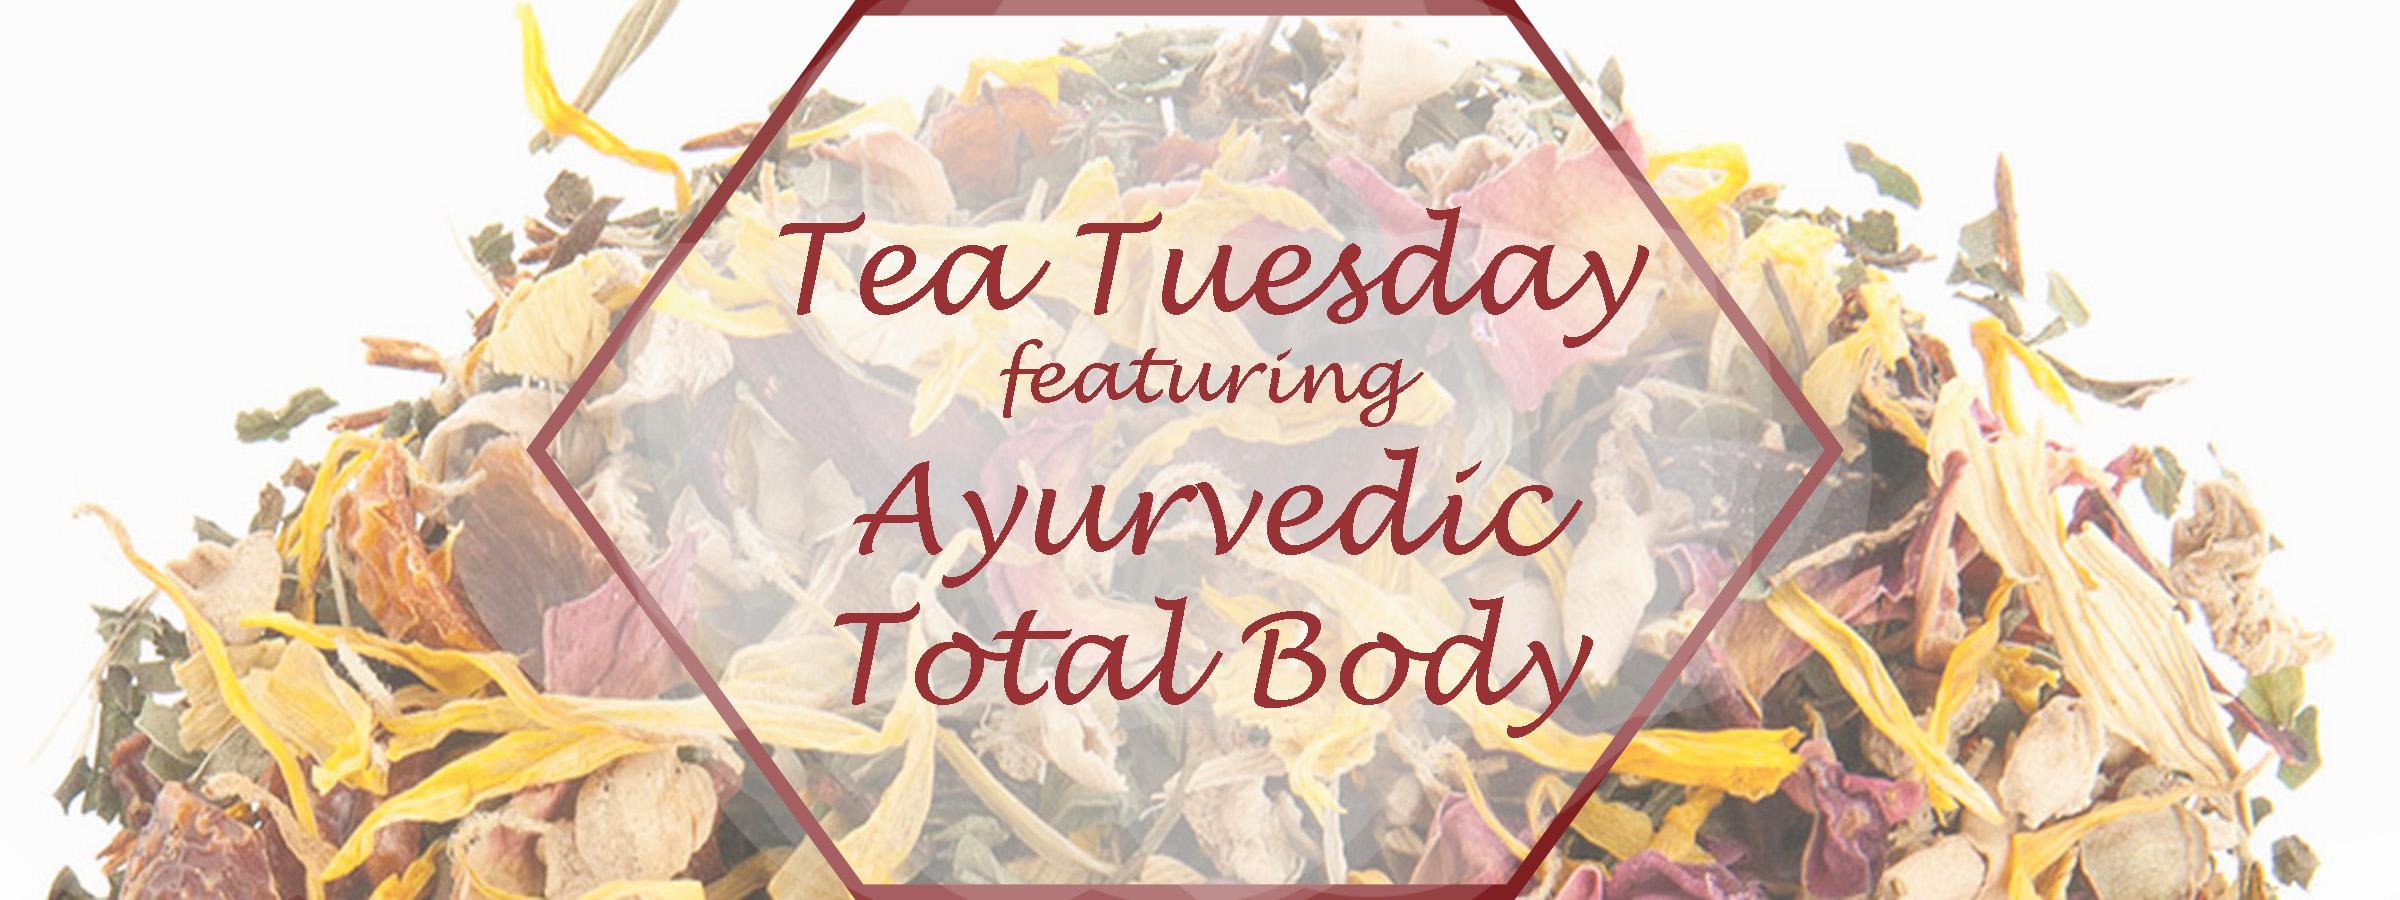 Tea Tuesday: Ayurvedic Total Body